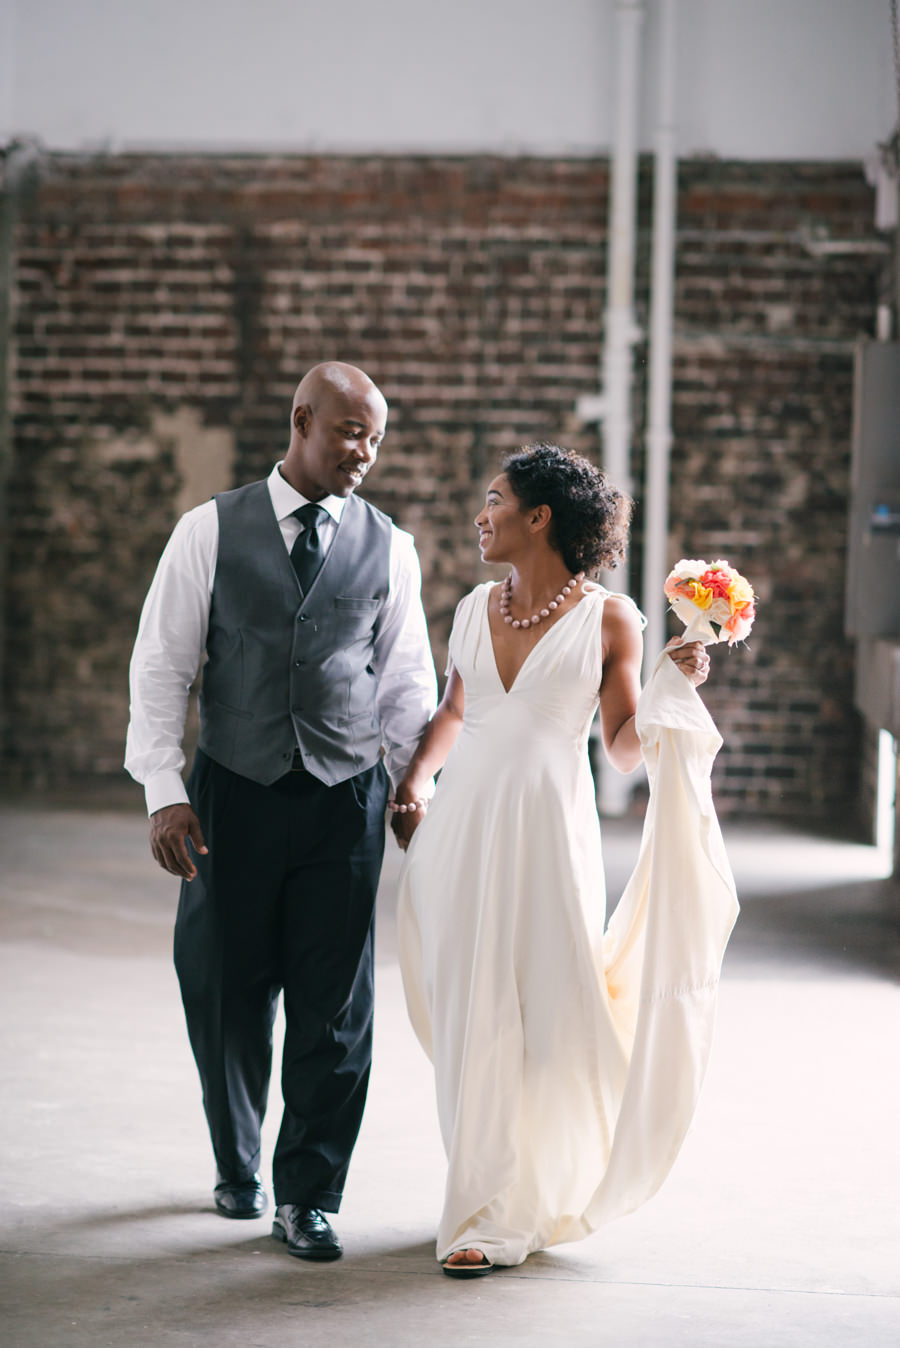 Wedding Day Portrait of Bride in Sheath Ivory Wedding Gown with Groom in Grey Vest